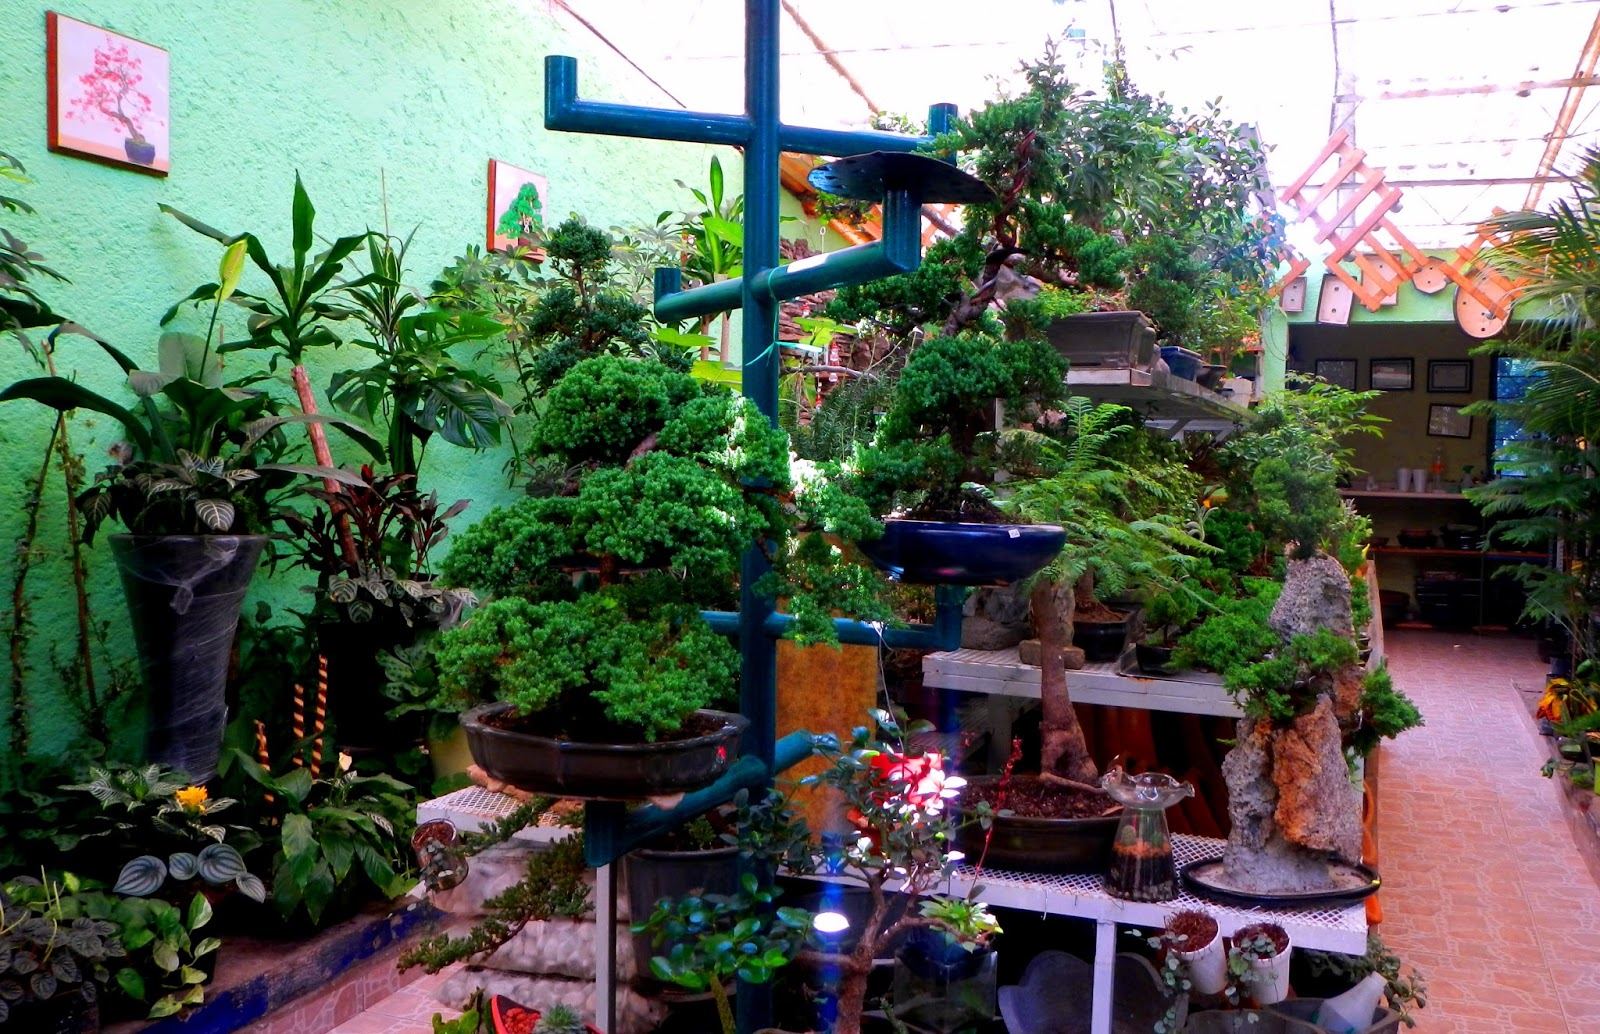 Mercado de plantas viveros de coyoac n for Plantas de vivero